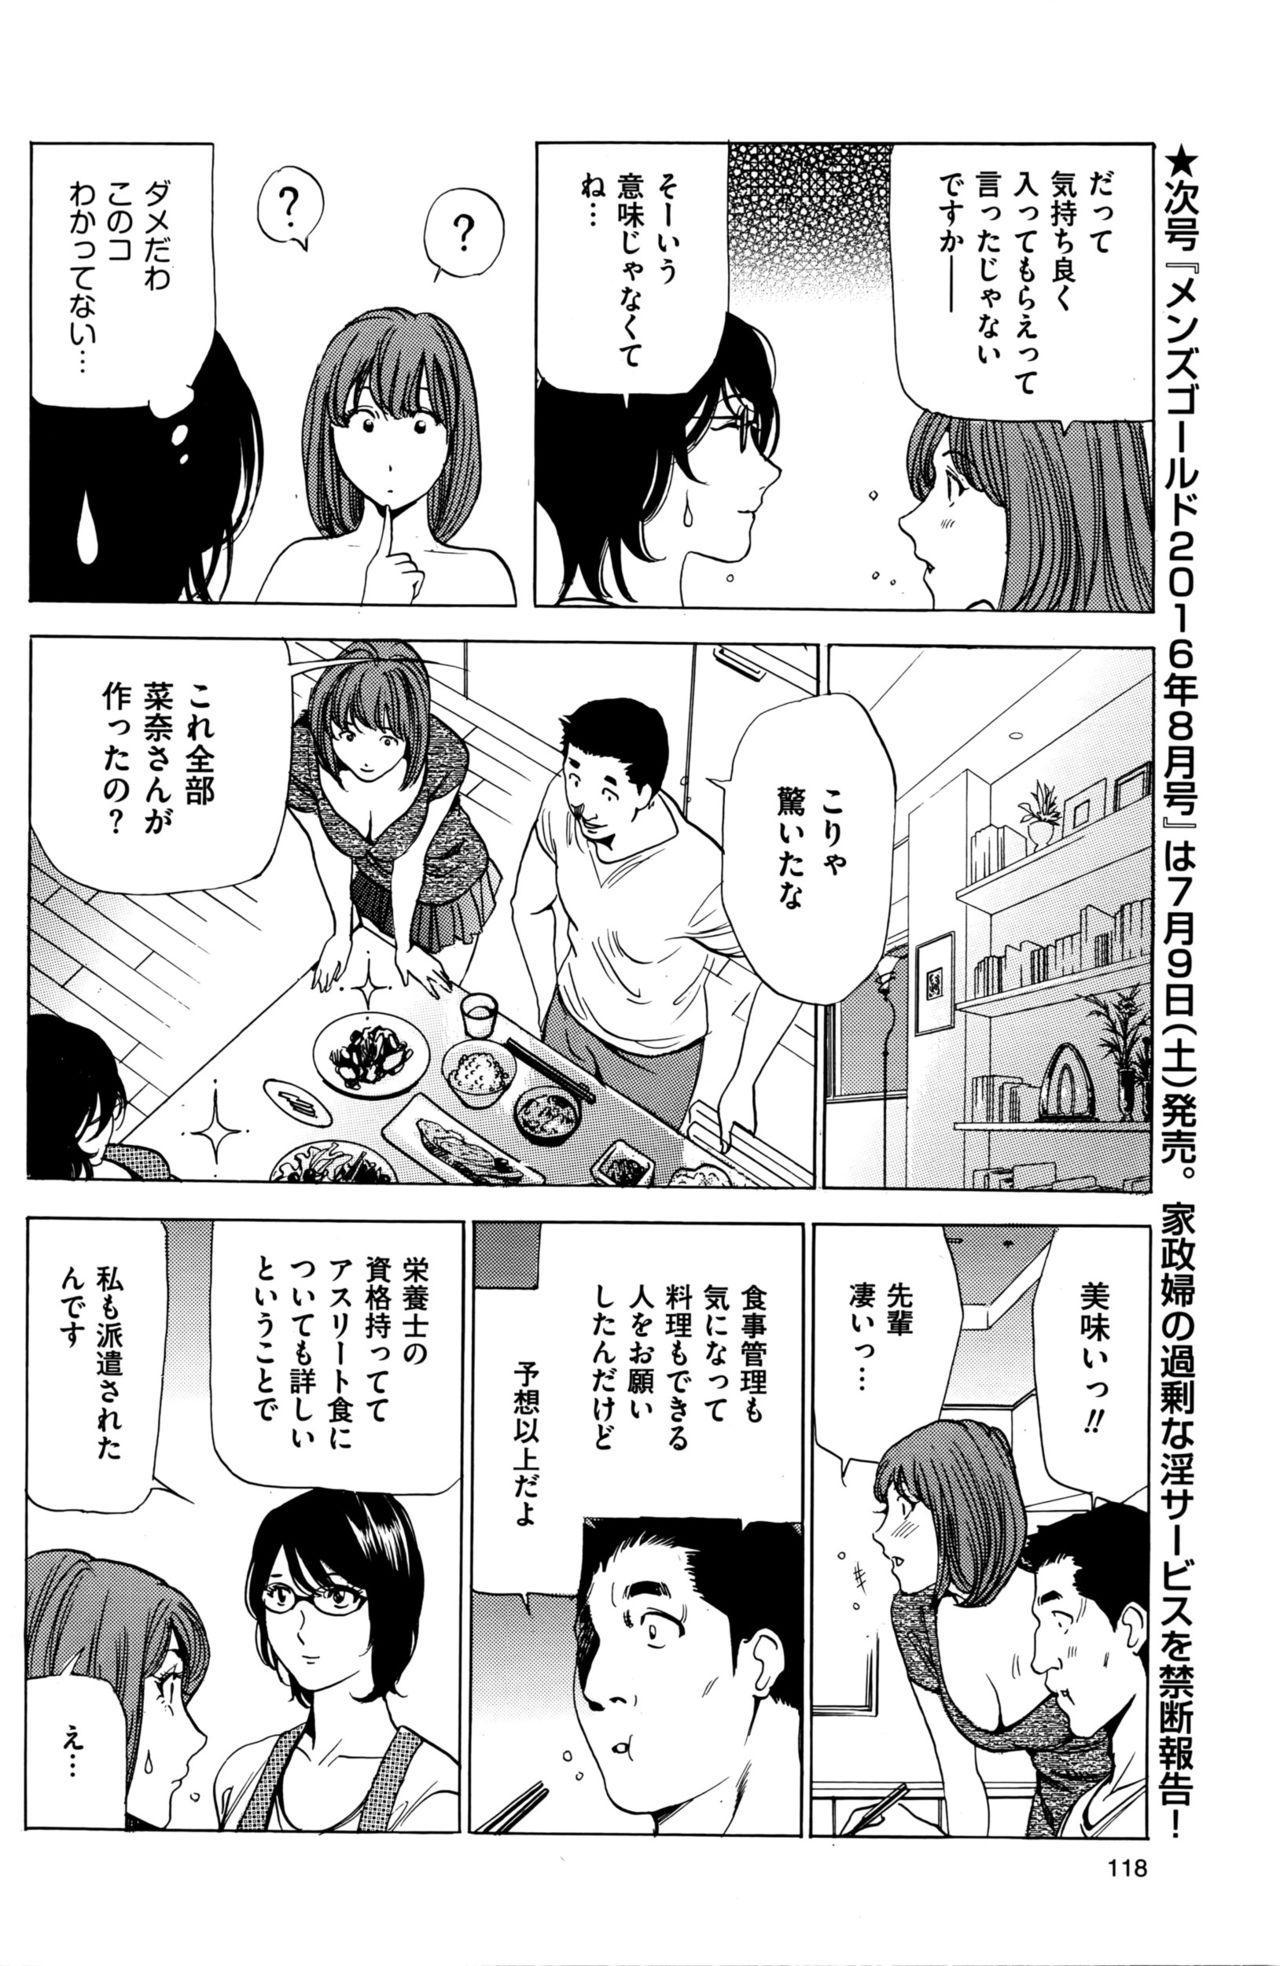 Wa Usuki Ipa a 1-10 44